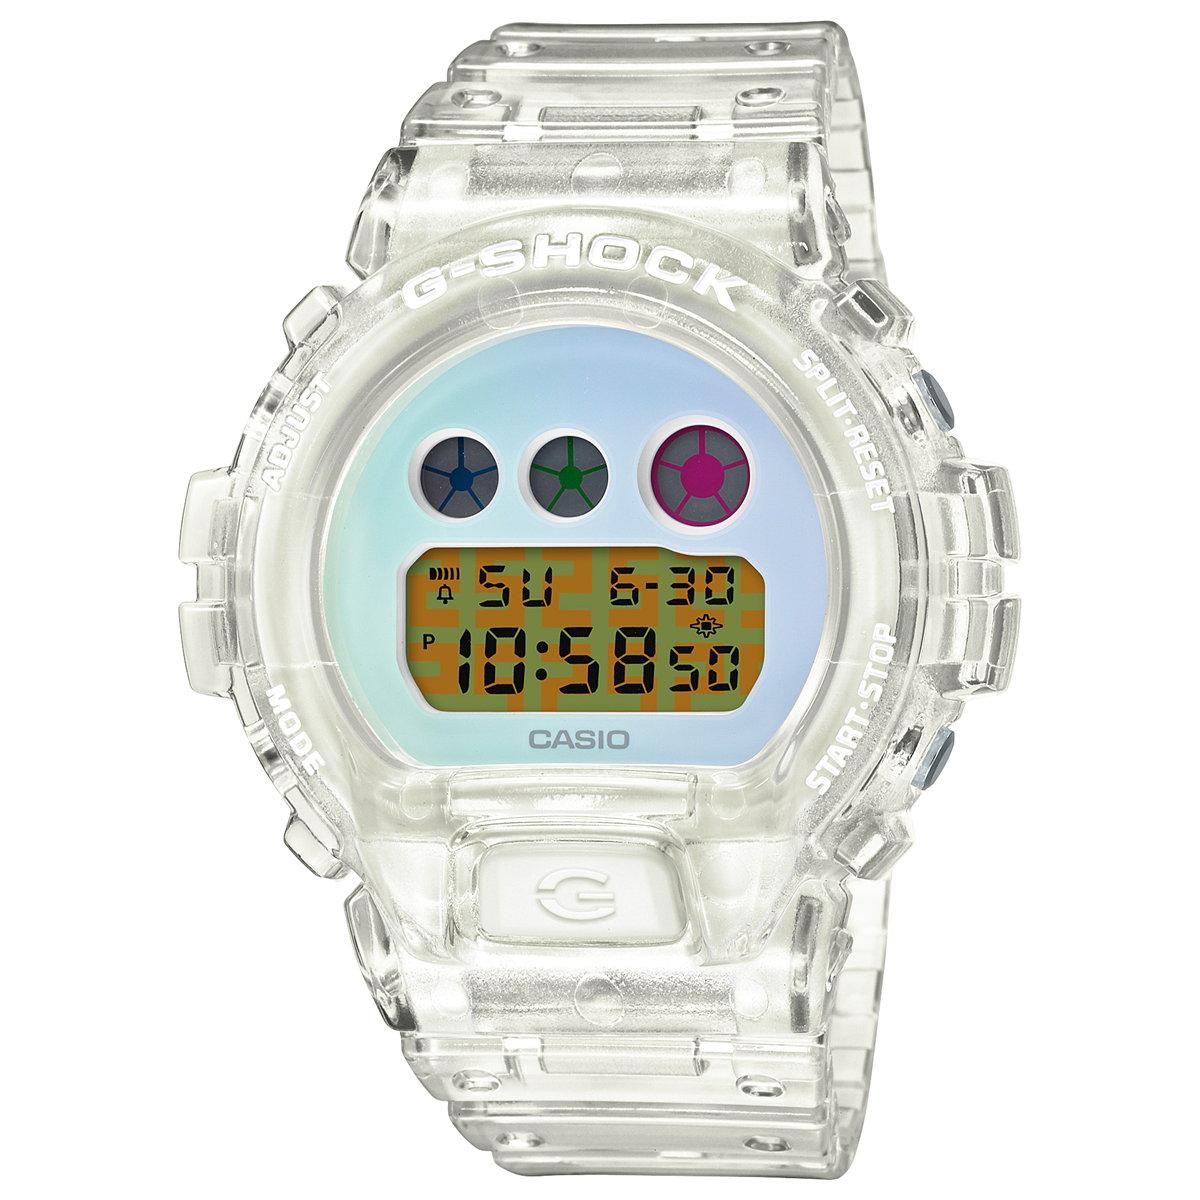 Gショック G-SHOCK 限定モデル 腕時計 メンズ DW-6900 25th Anniversary DW-6900SP-7JR ジーショック